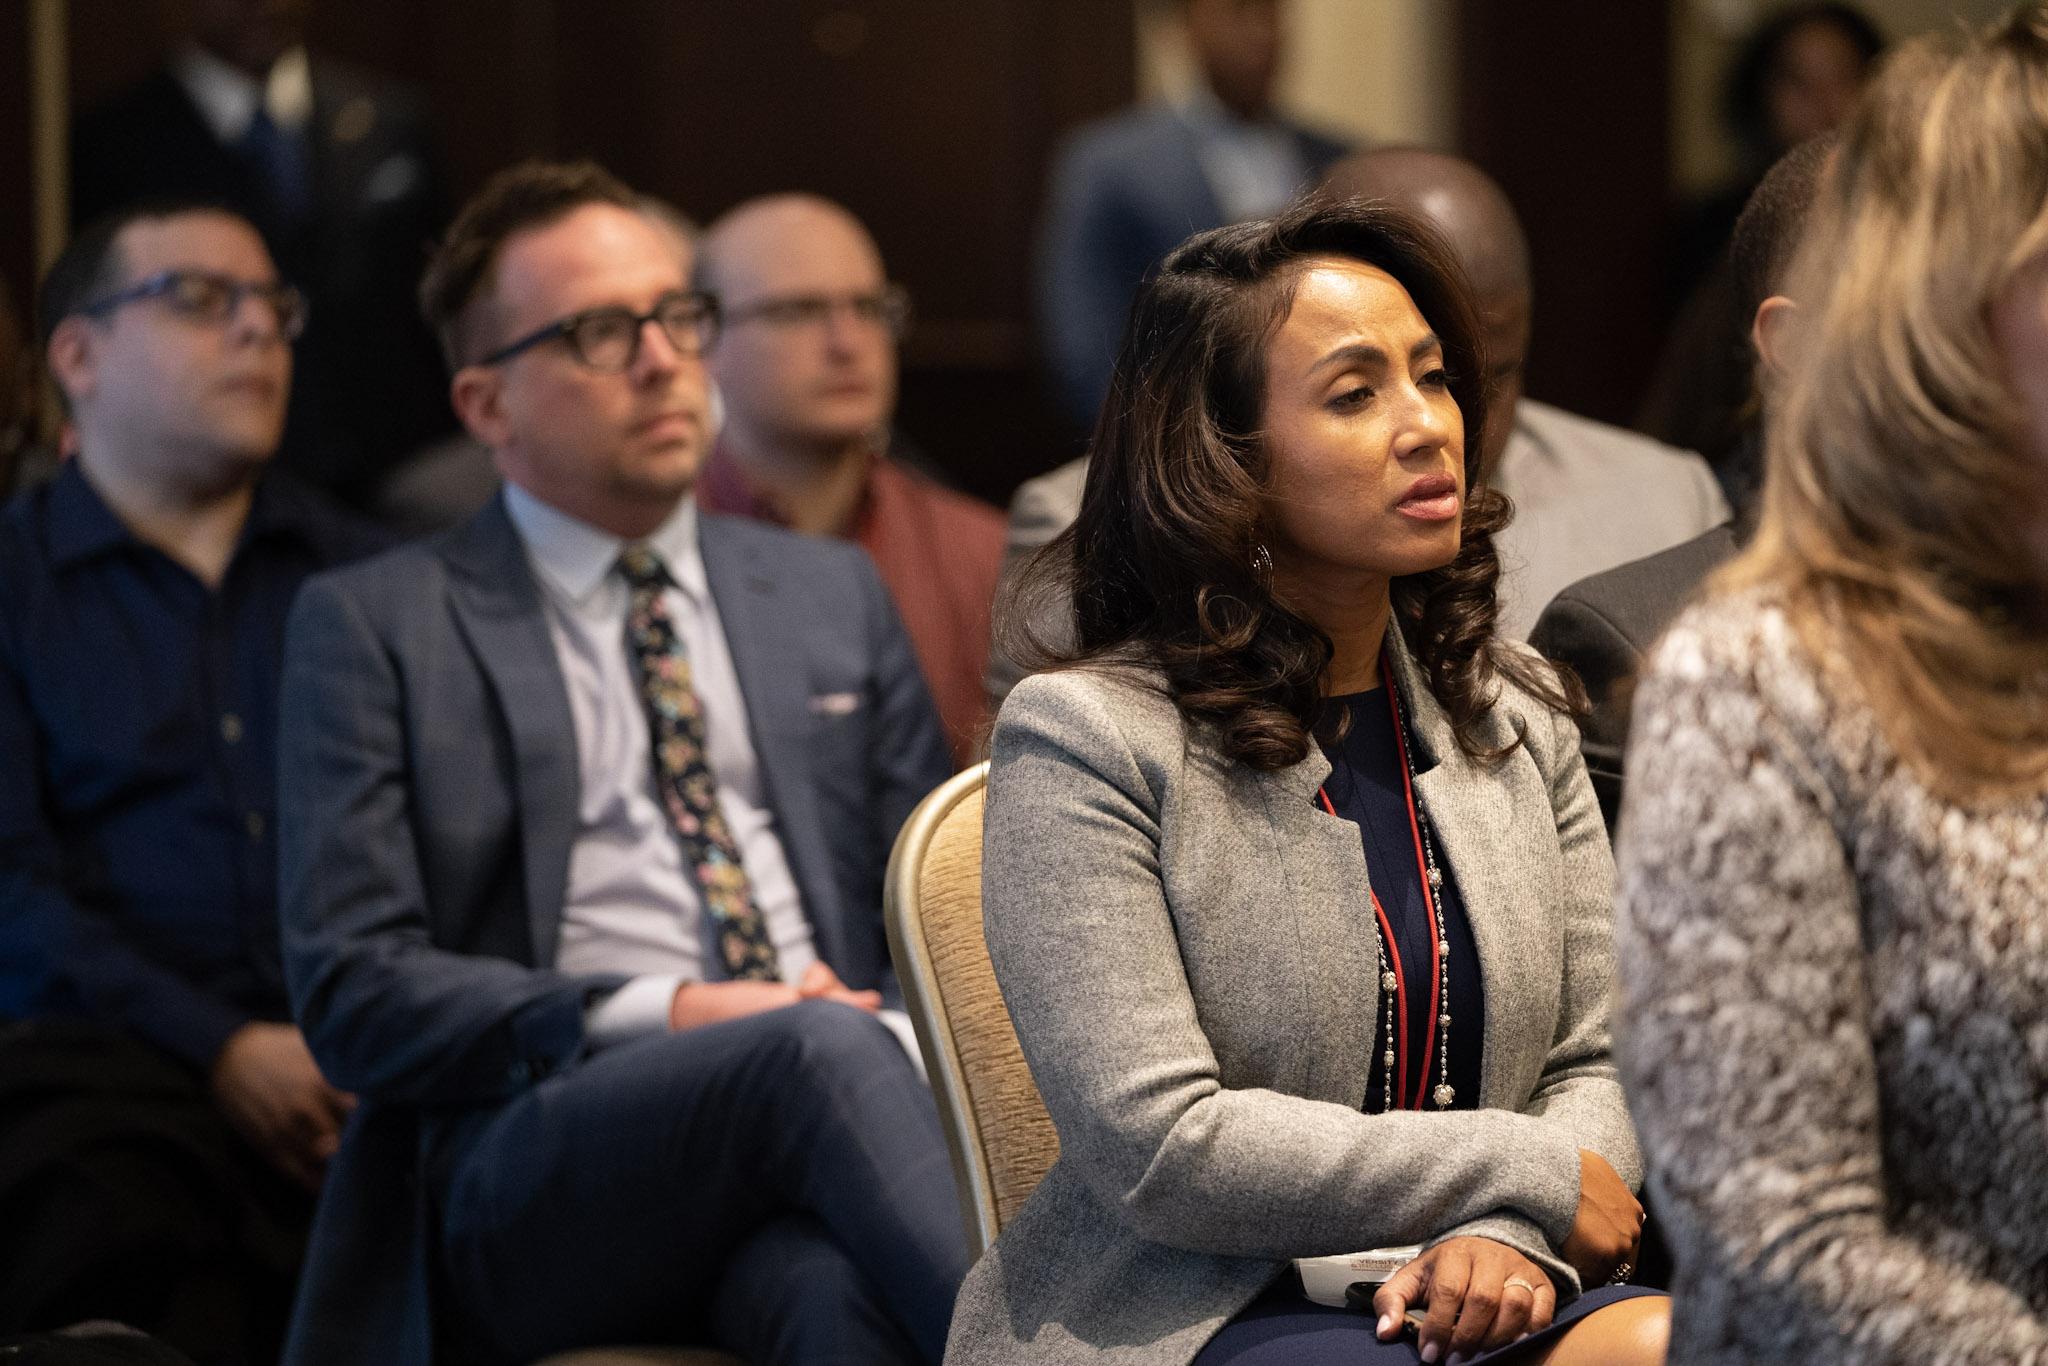 2019 Philadelphia Diversity & Inclusion Conference-106462-March 25, 201999.jpg